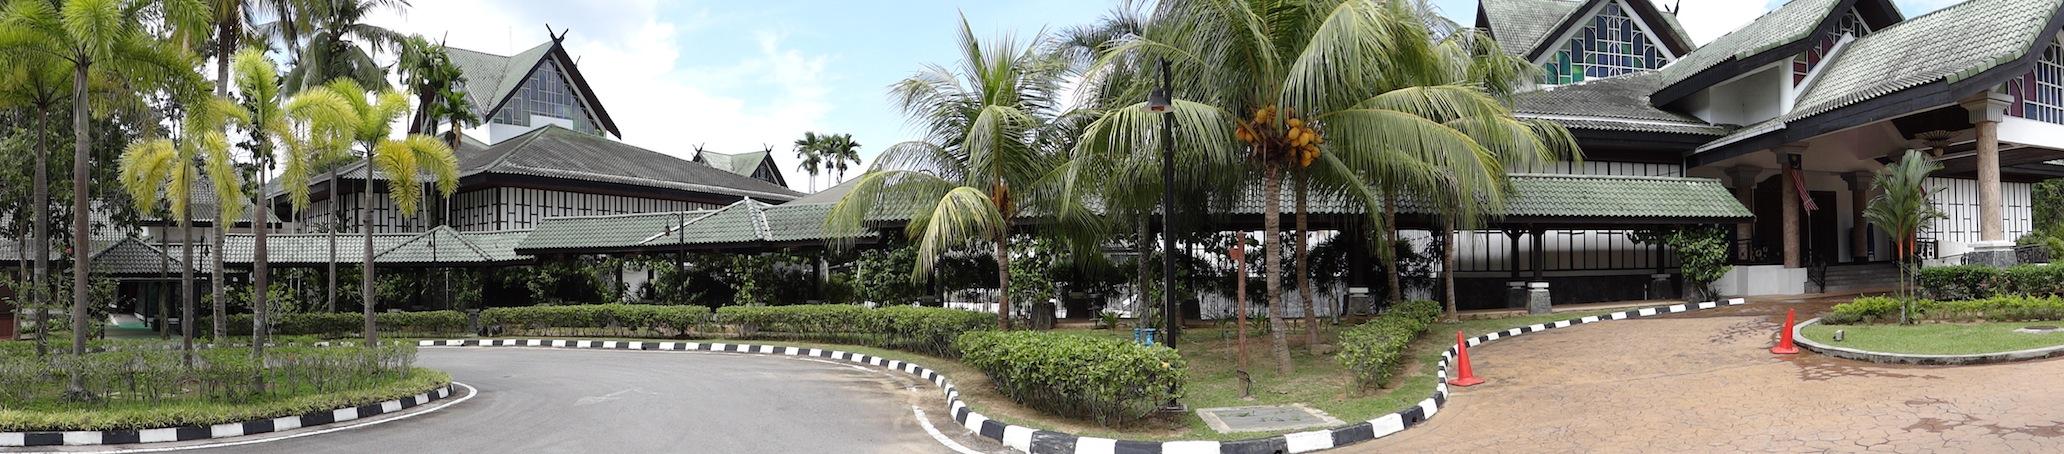 35 Panorama Galeria Perdana Langkawi